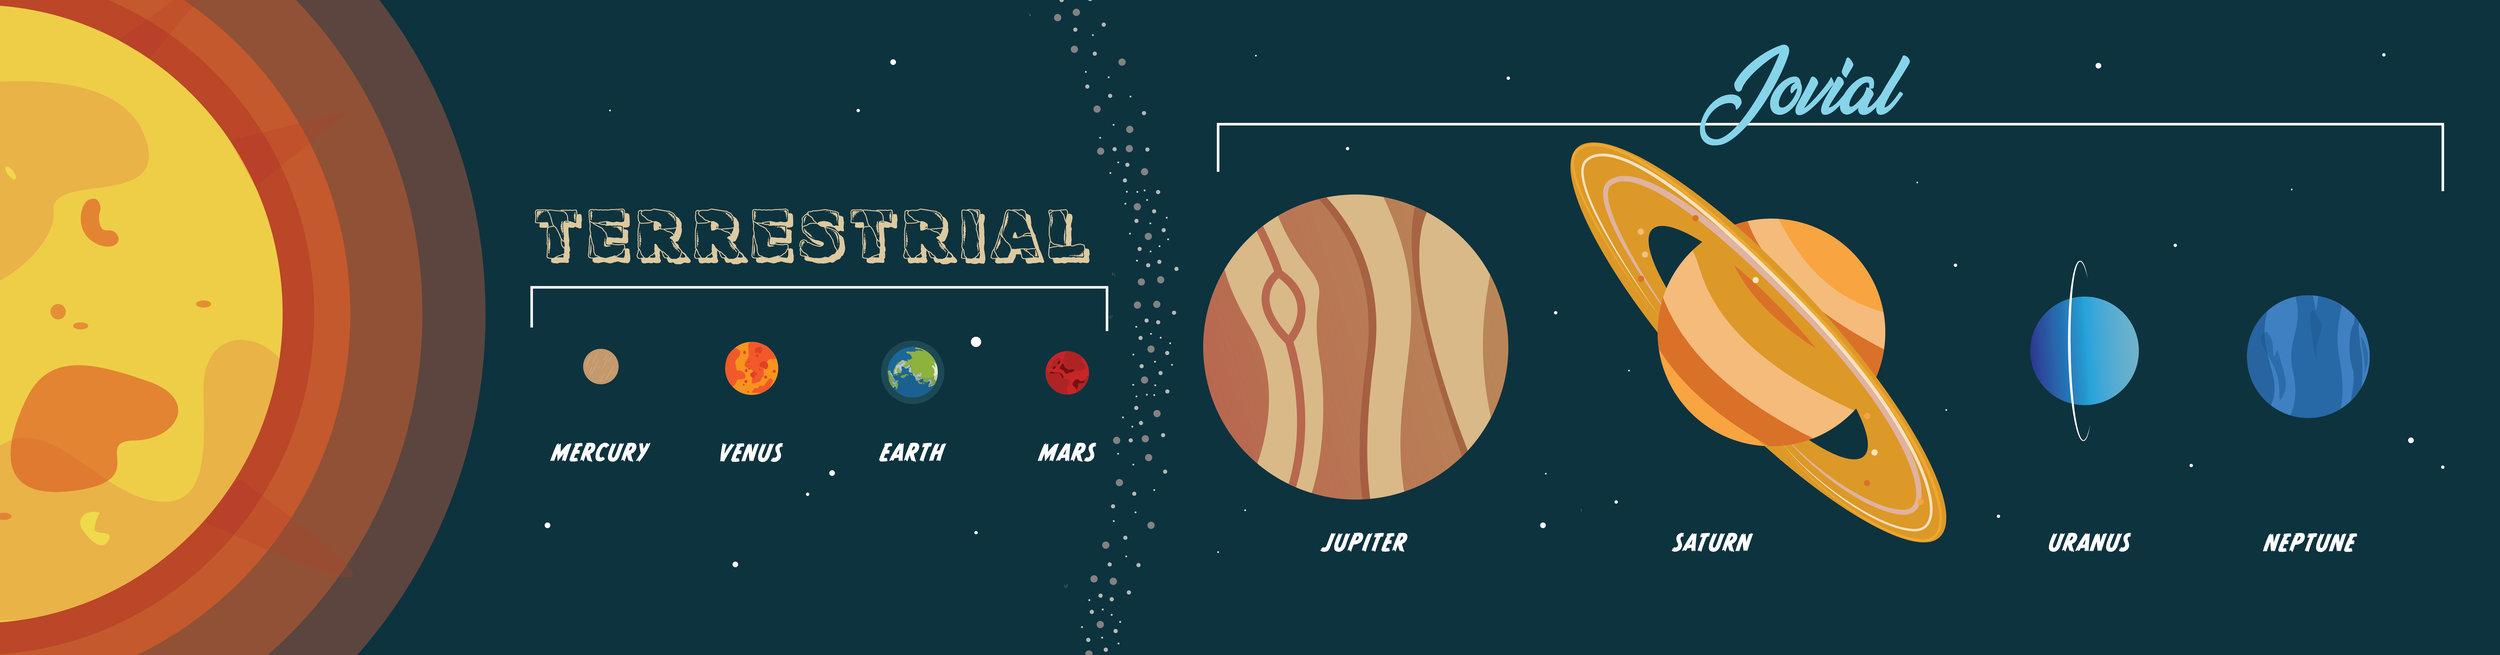 orderofplanets-05.jpg